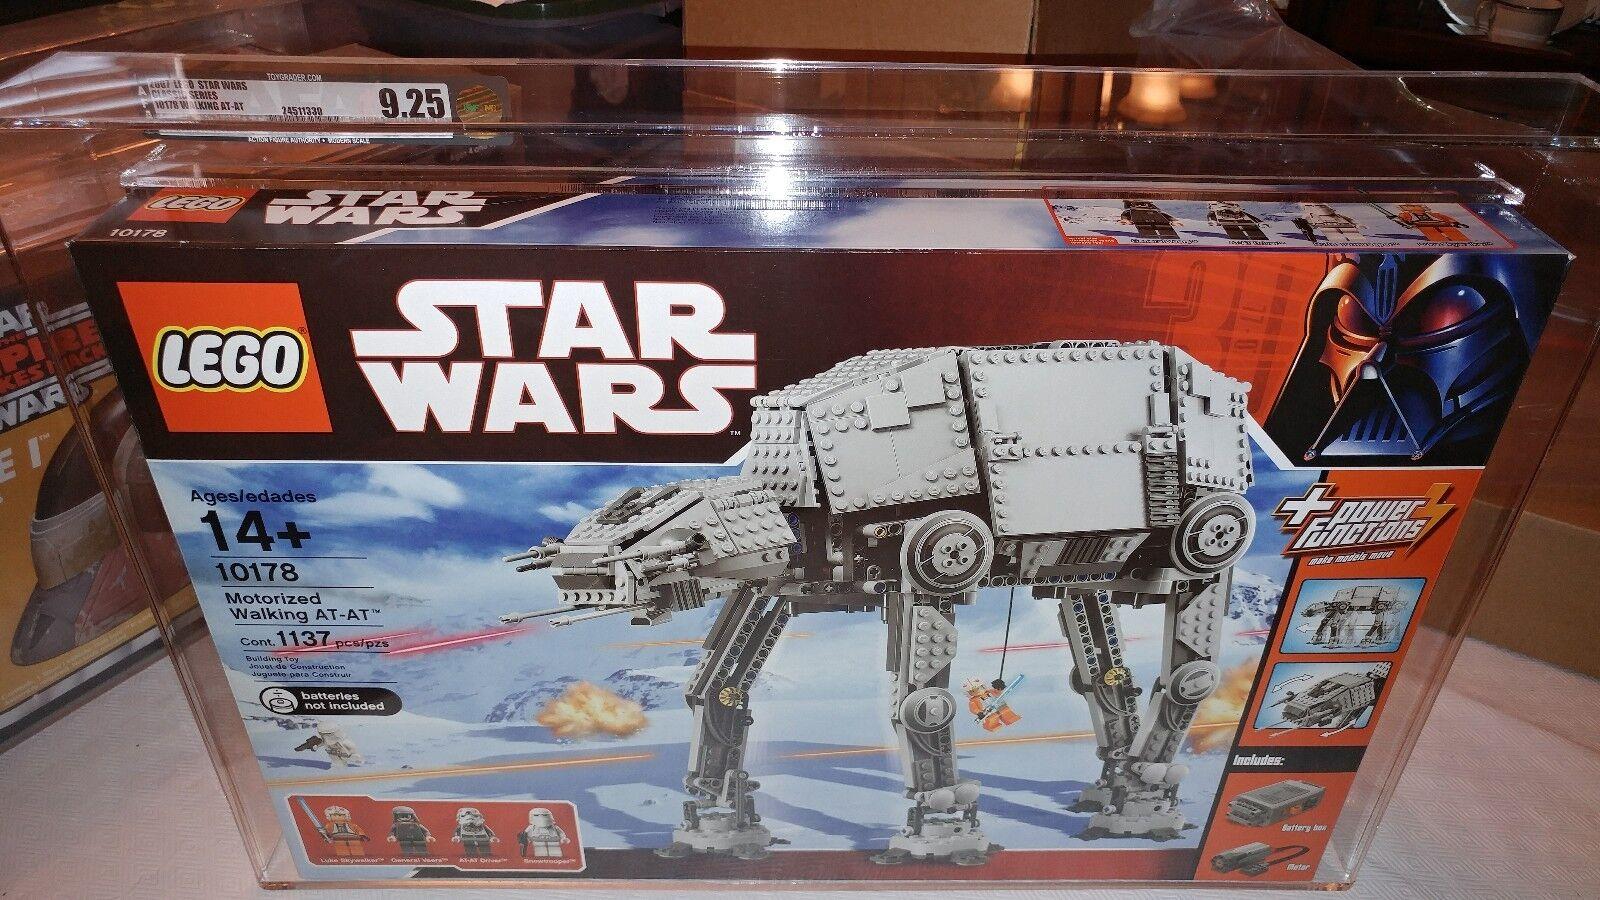 LEGO estrella guerras  Motorized Walre AT-AT (10178)  AFA 9.25 MISB  online economico